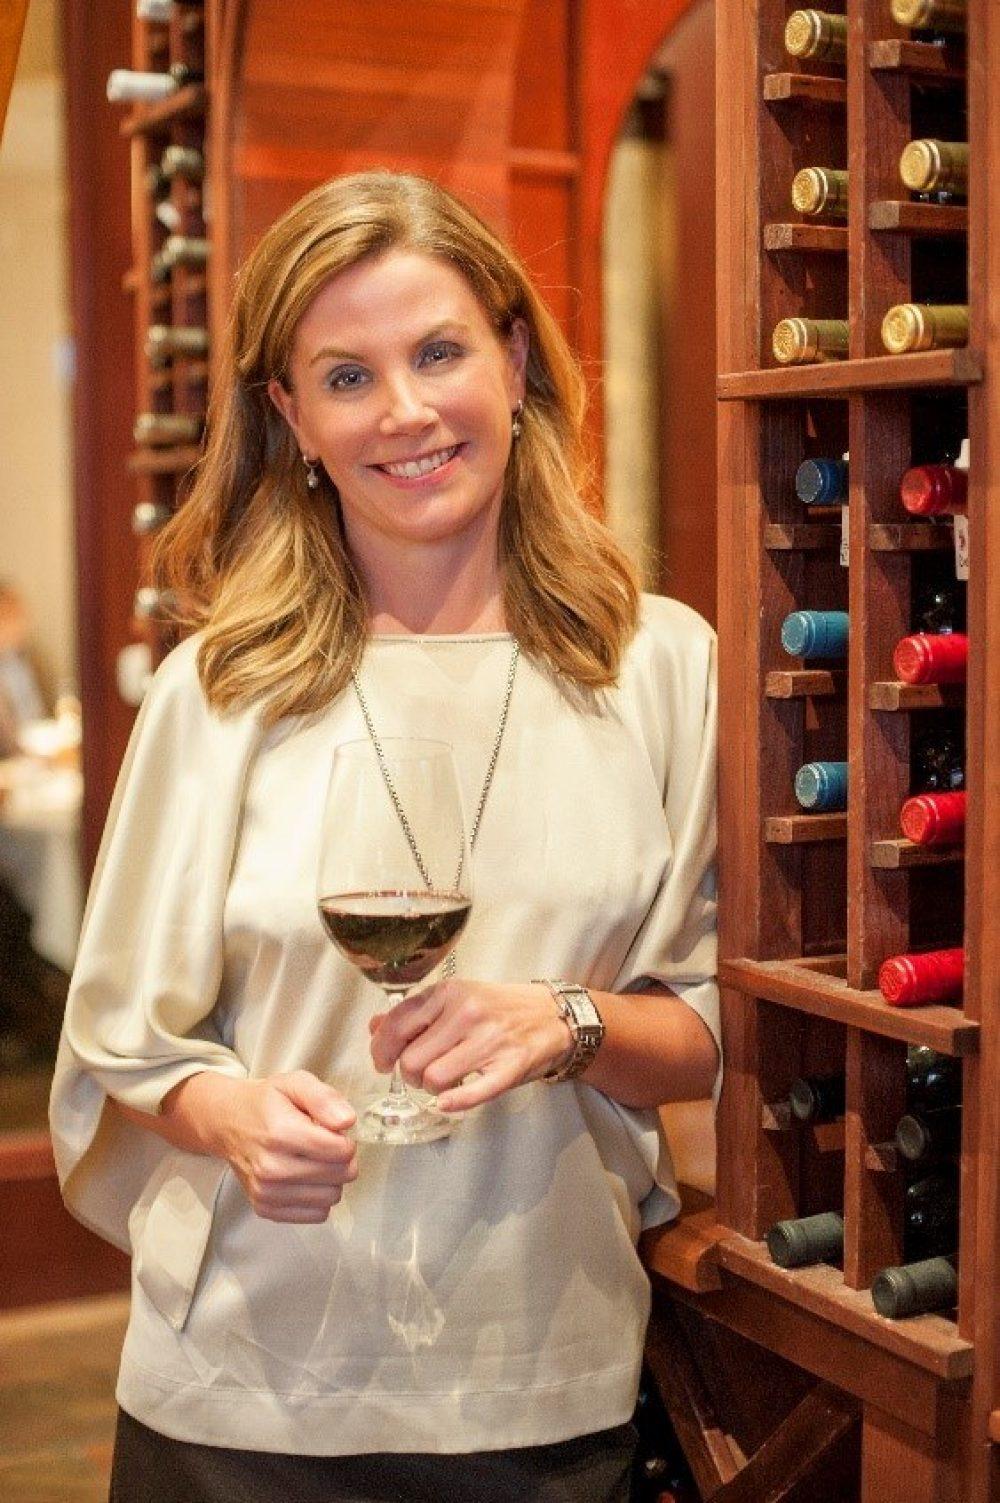 Perry's Corporate Sommelier and Beverage Director Susi Zivanovic